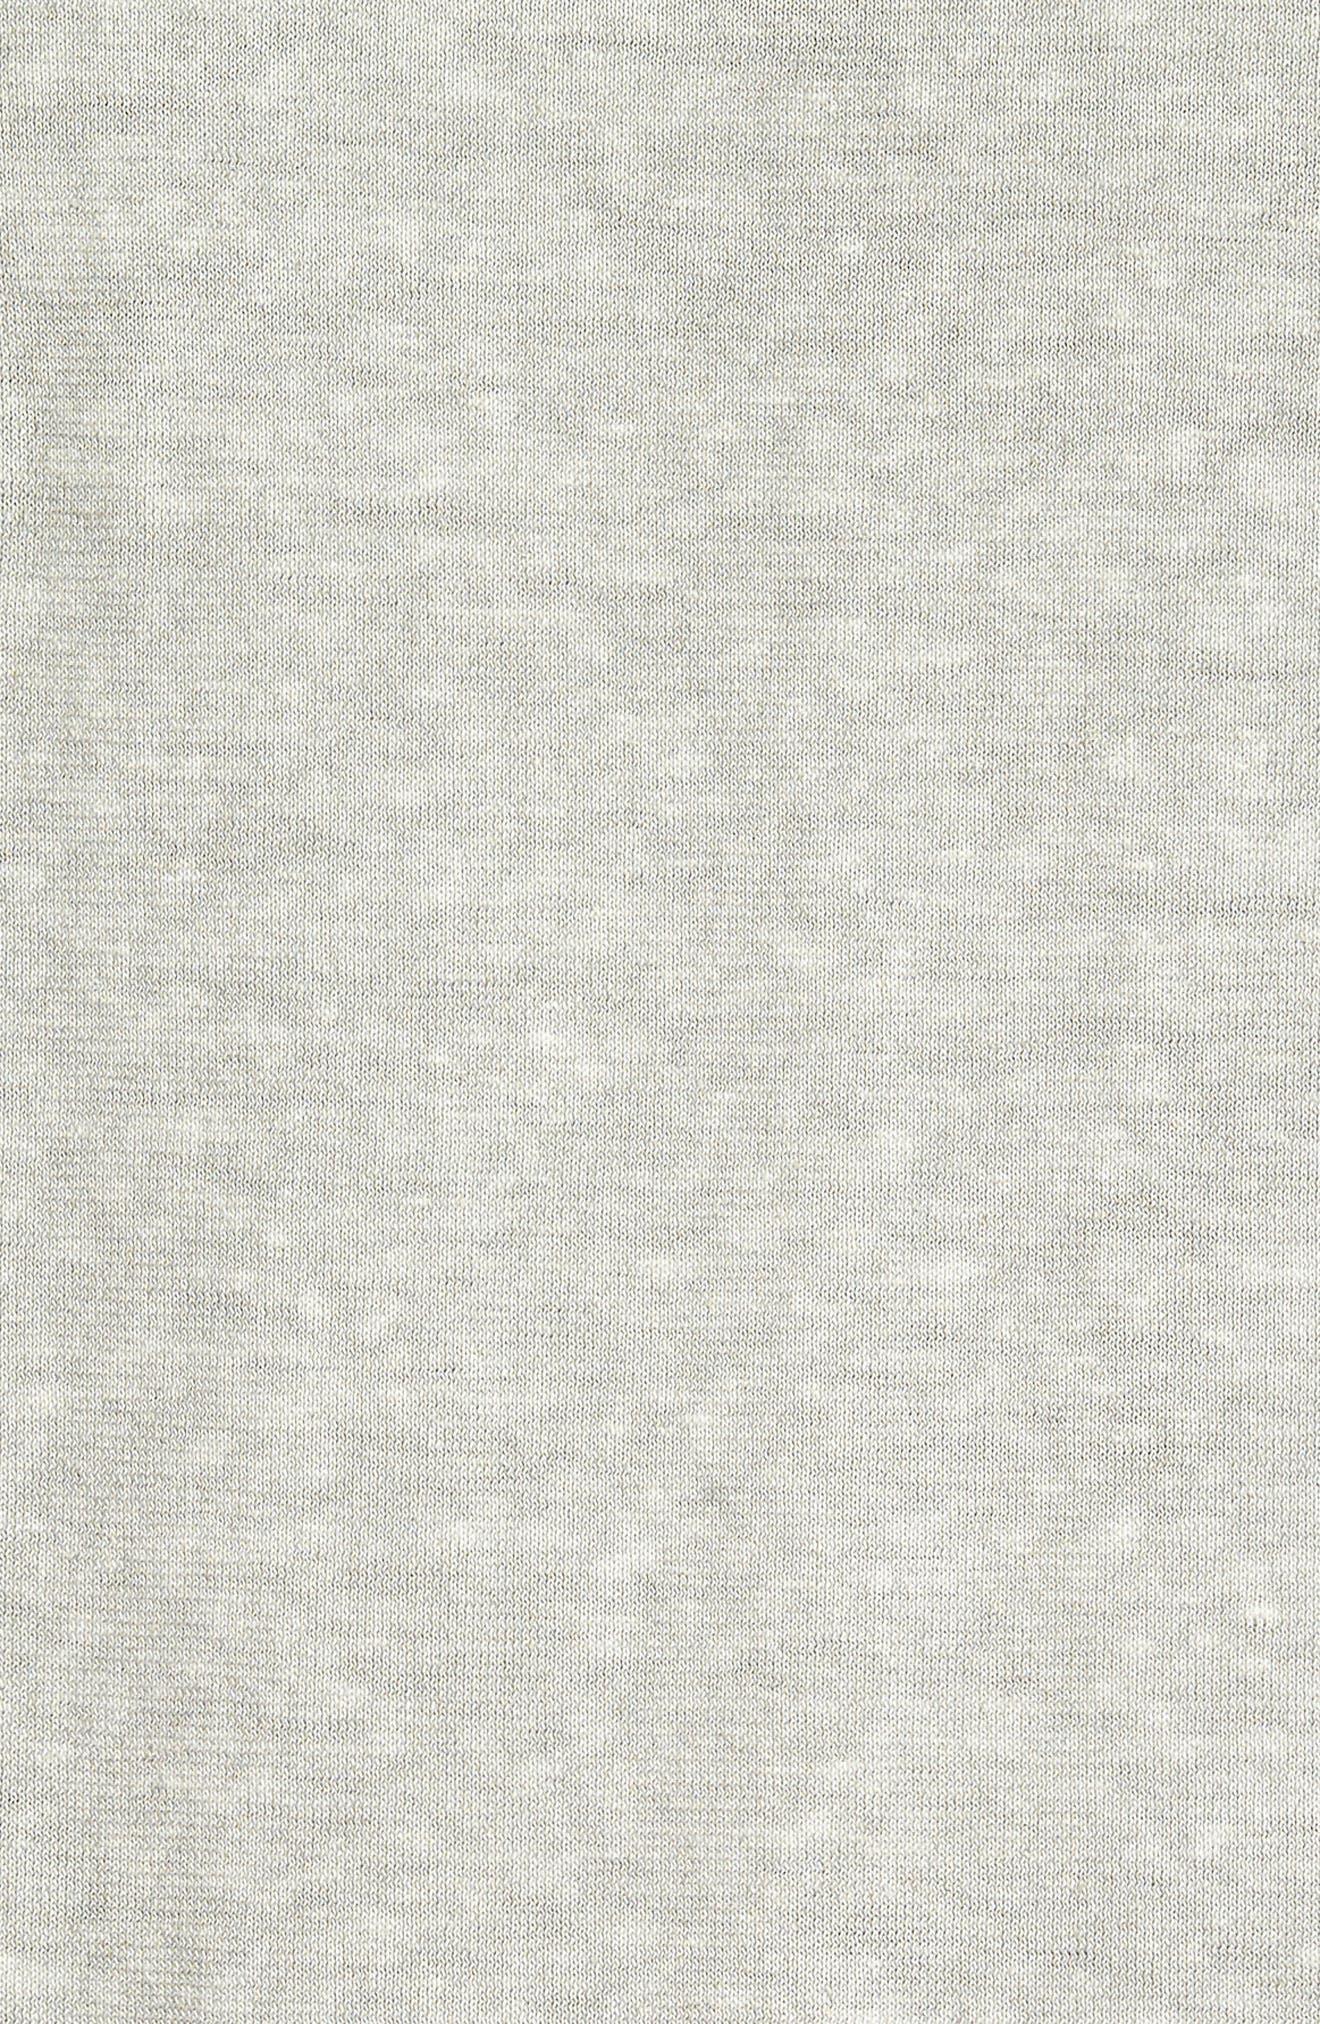 Camura T-Shirt,                             Alternate thumbnail 5, color,                             021